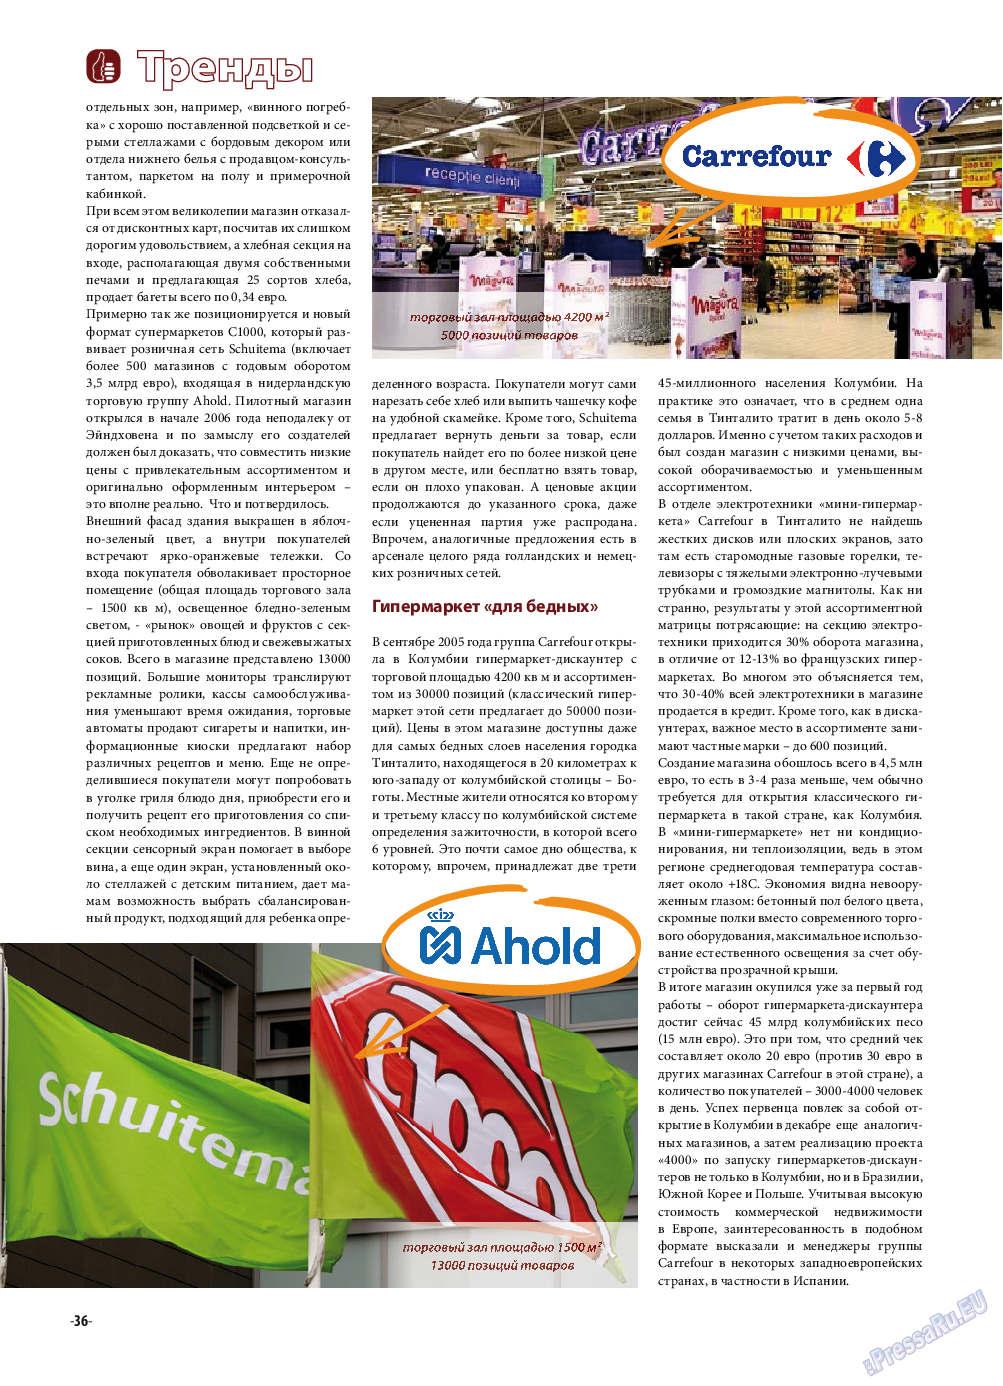 iDEAL (журнал). 2015 год, номер 2, стр. 36